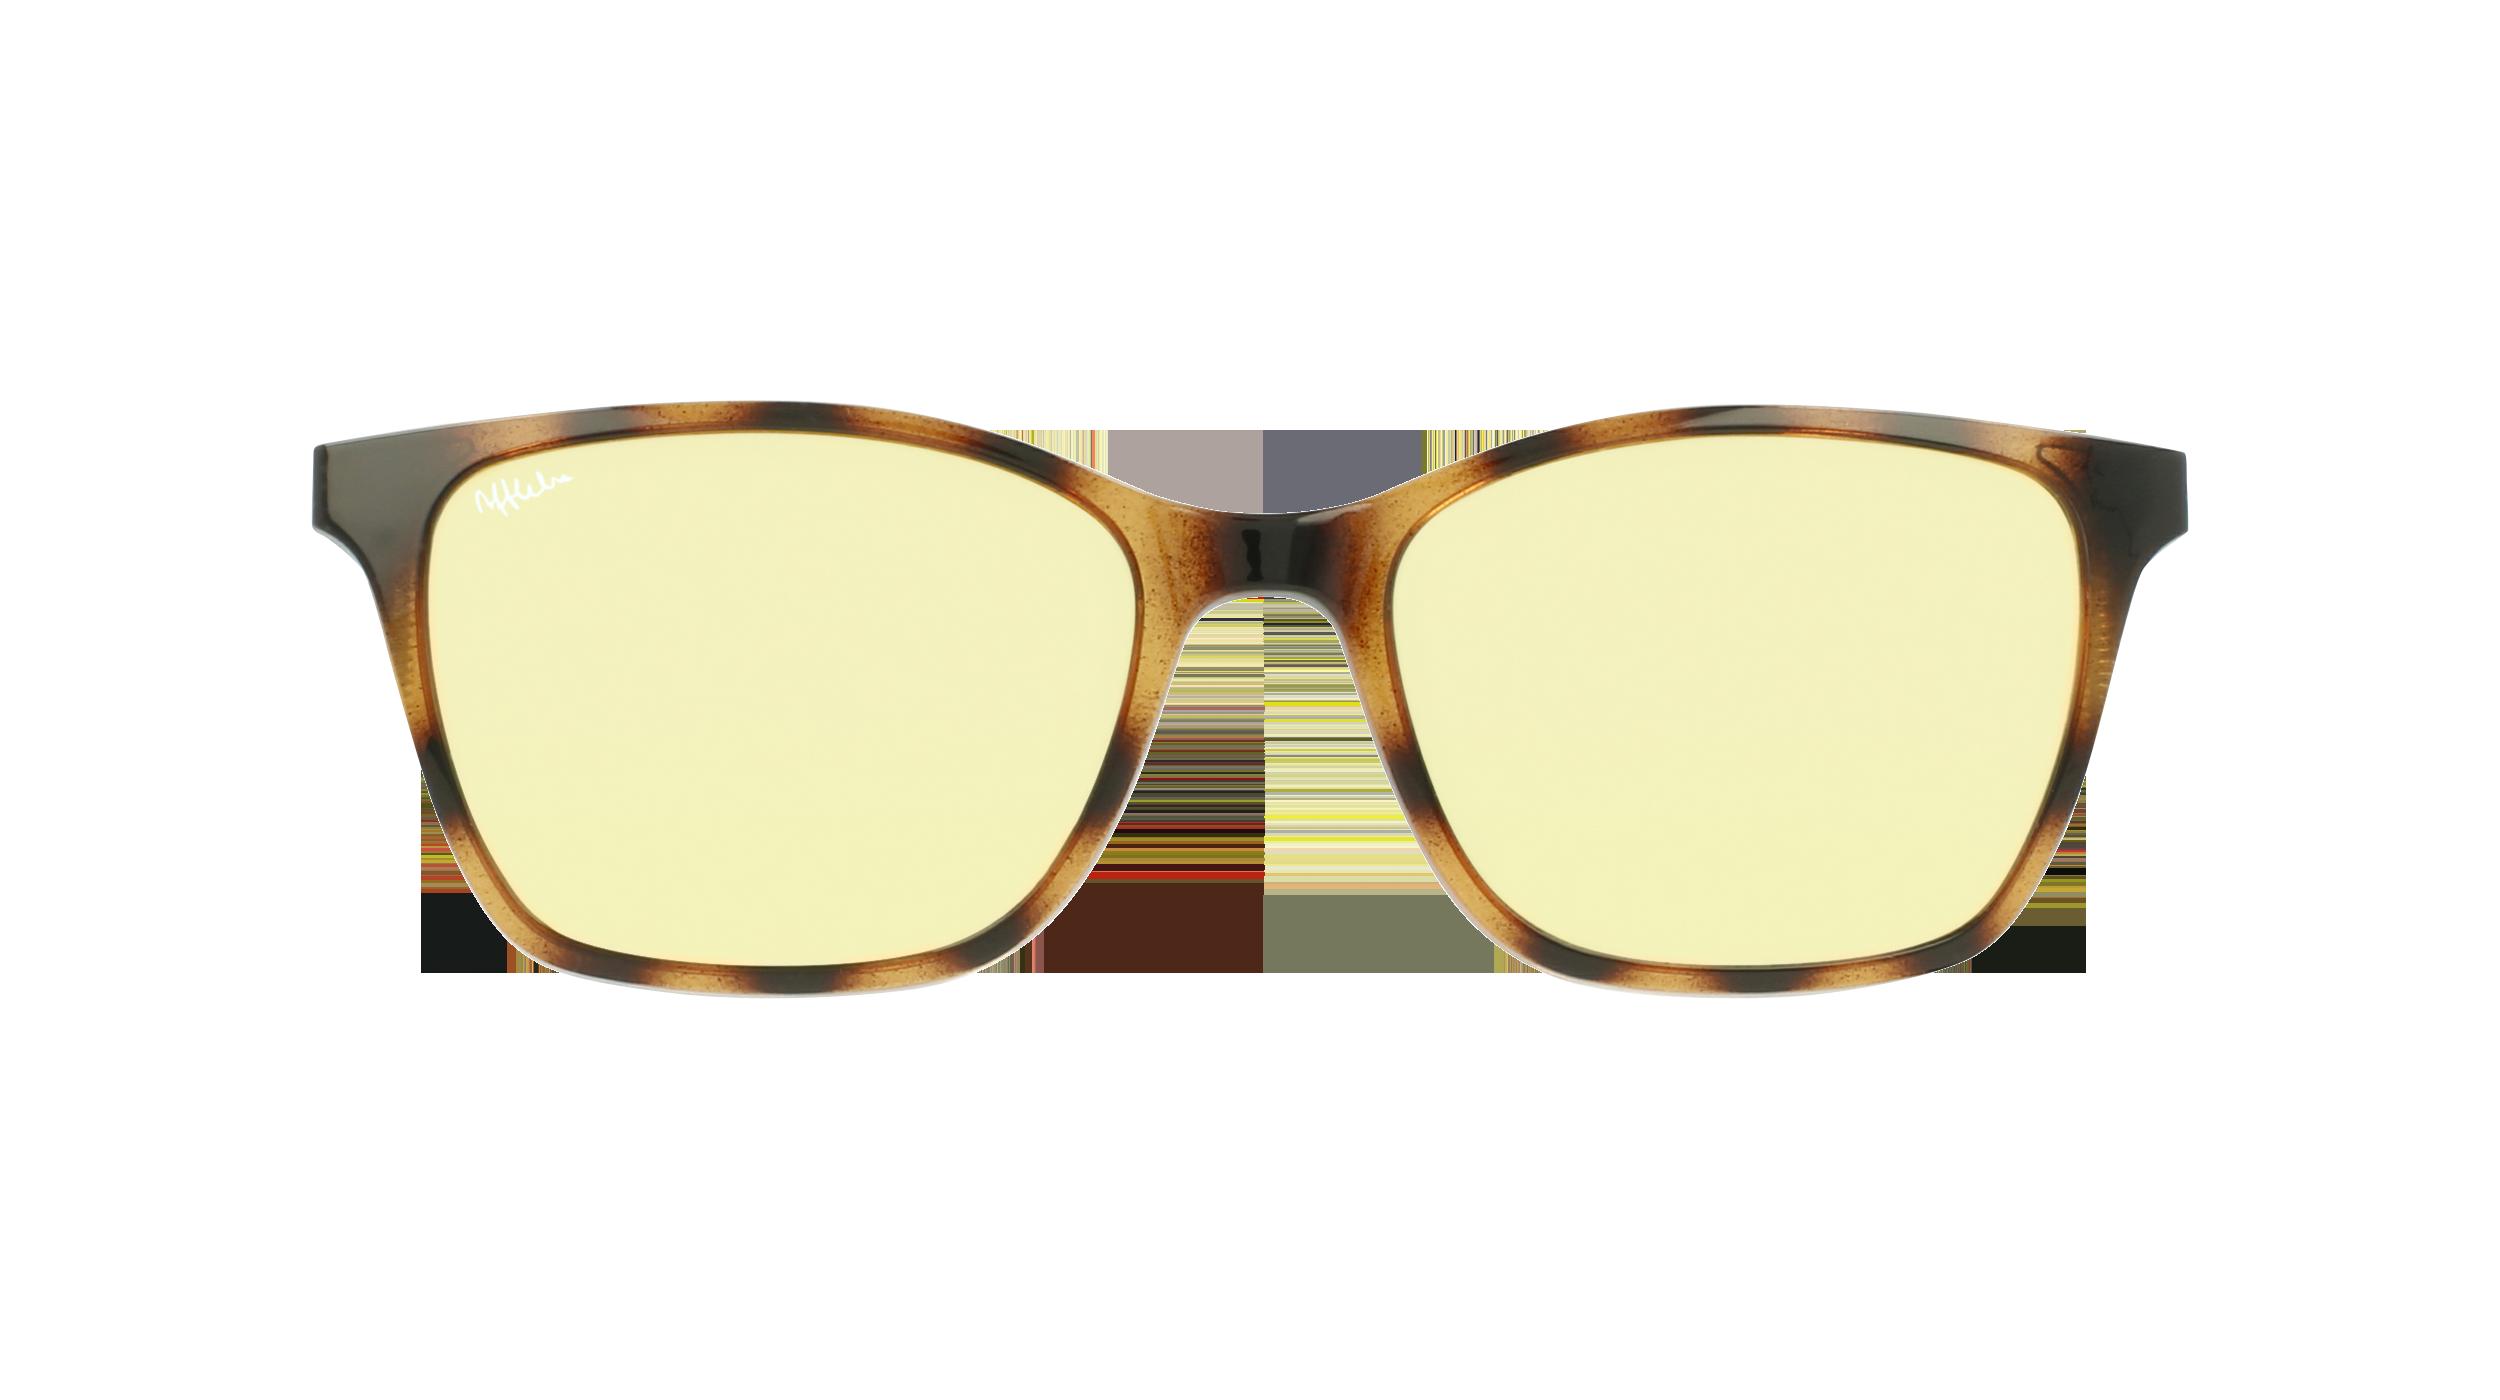 afflelou/france/products/smart_clip/clips_glasses/07630036457641.png